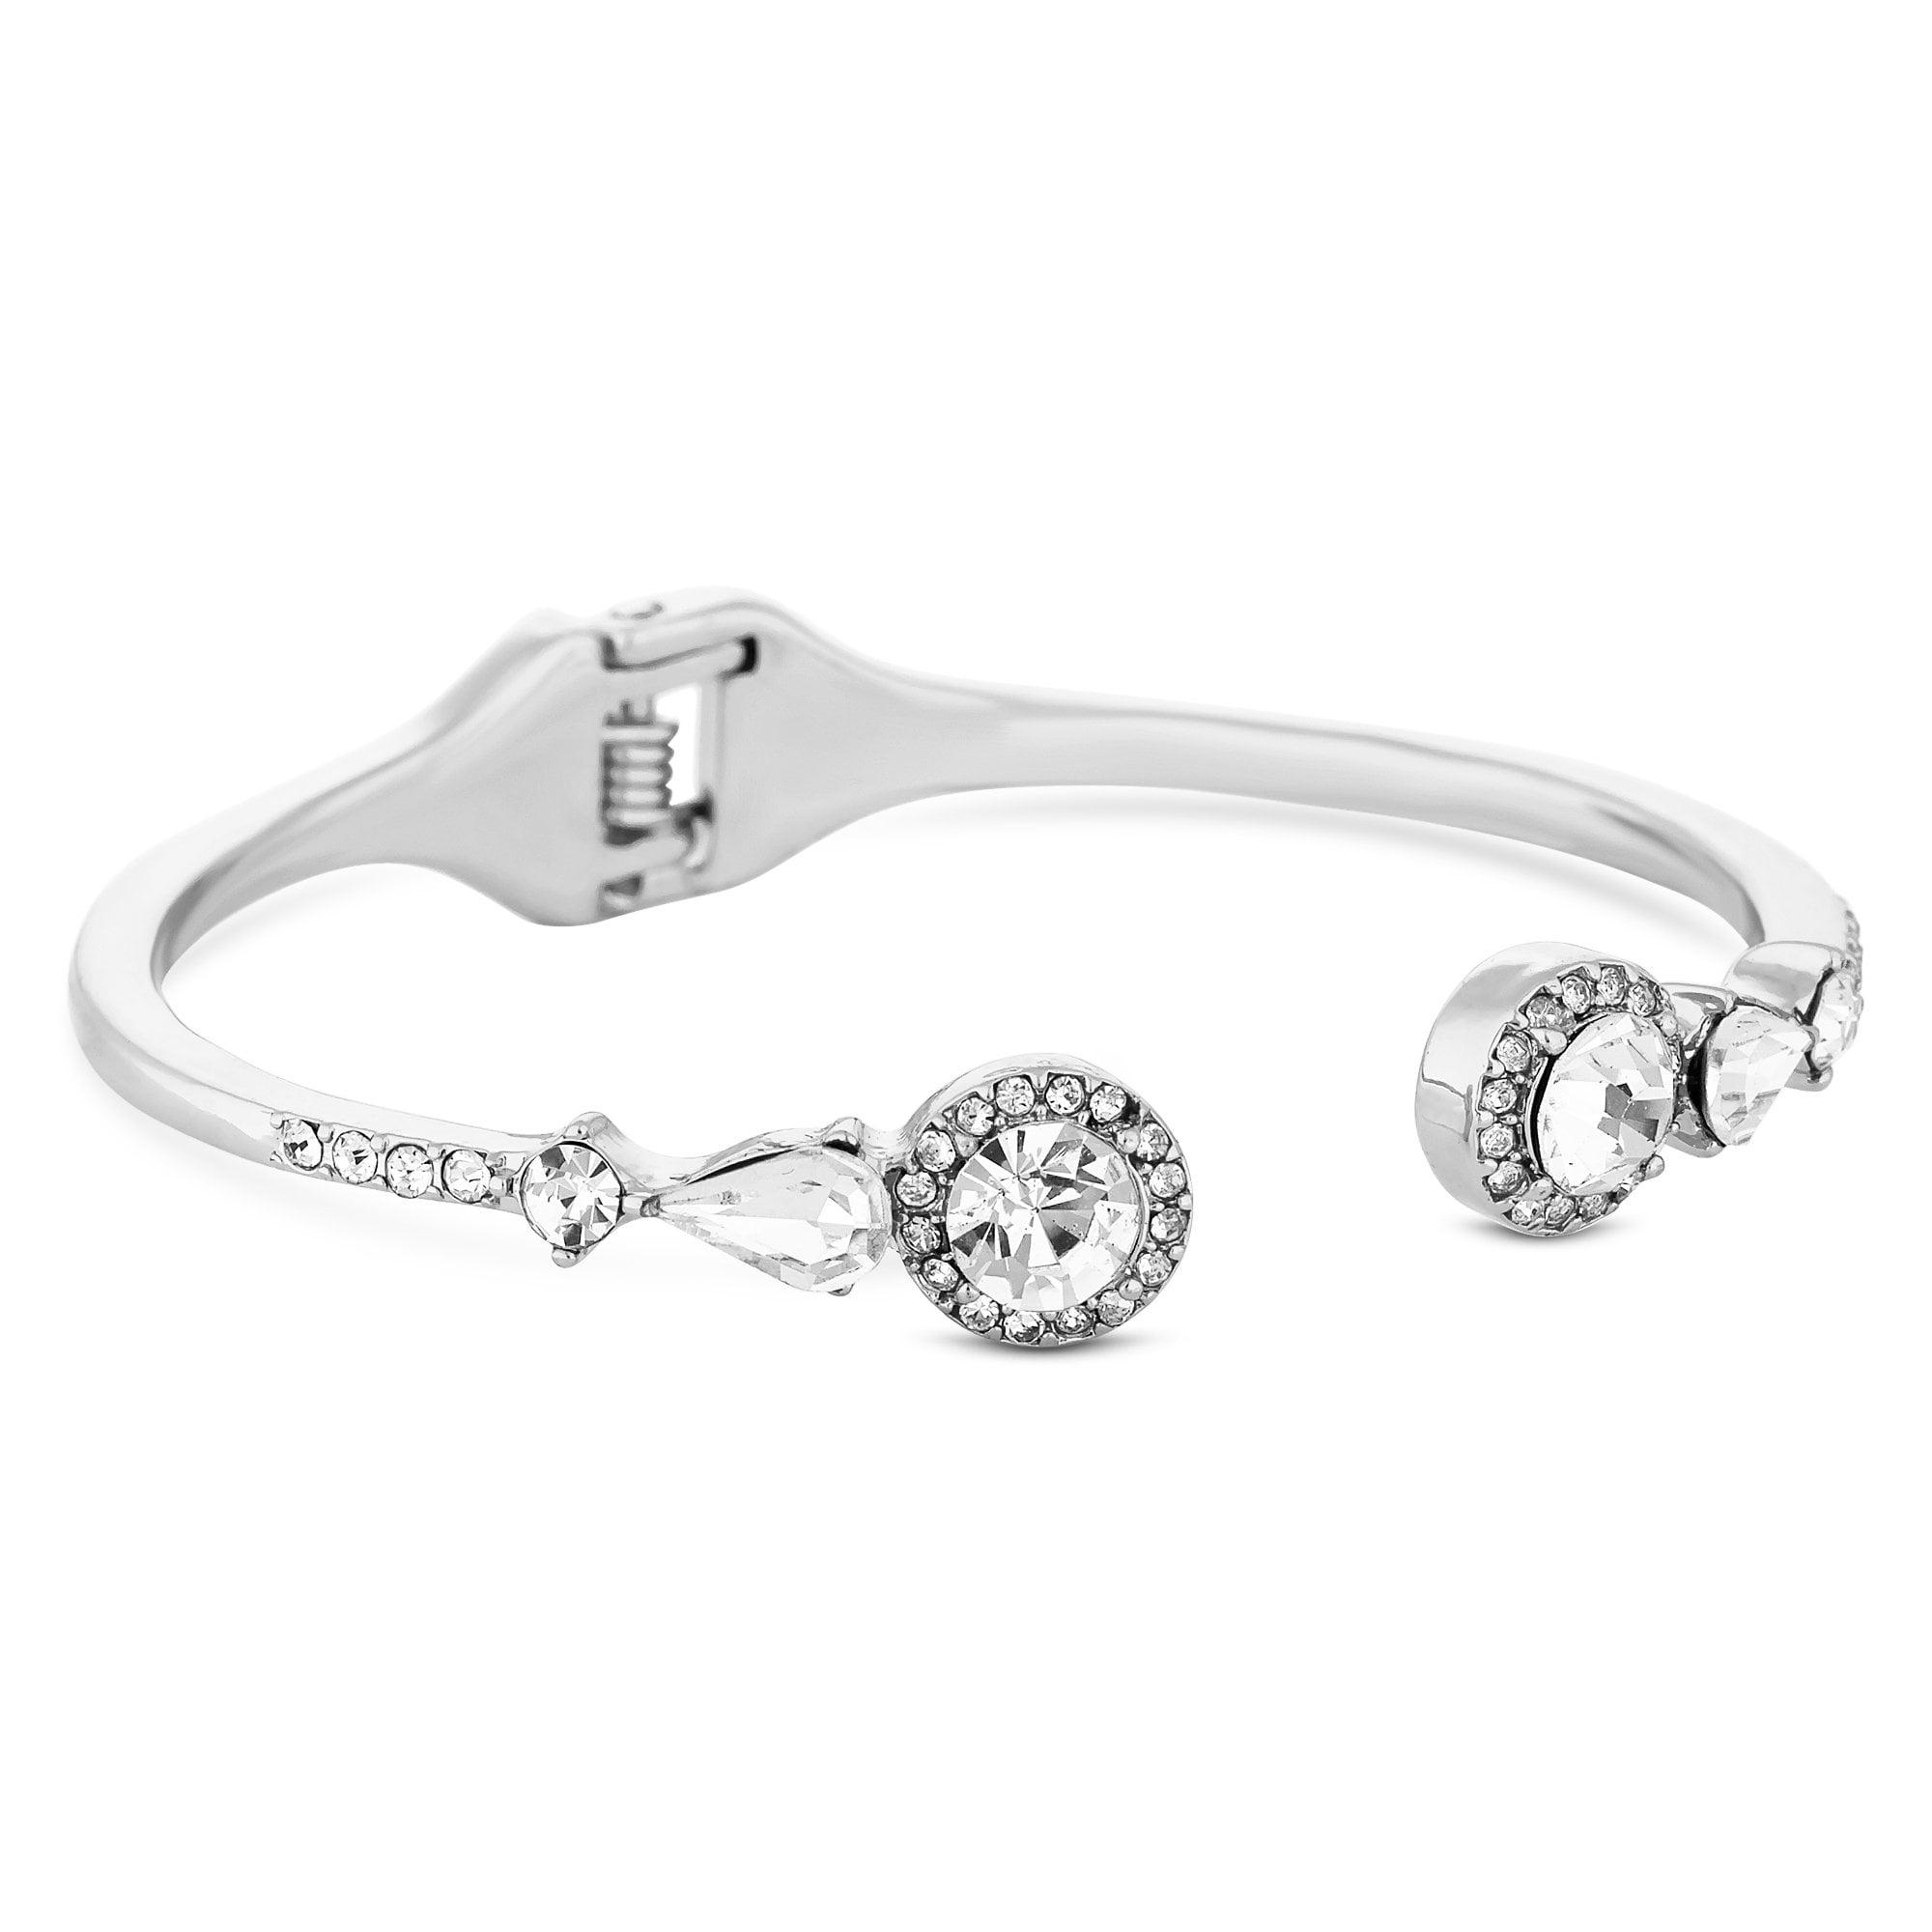 418b2760fa6a Jon Richard Silver Open Crystal Halo Bangle - Jewellery from Jon ...